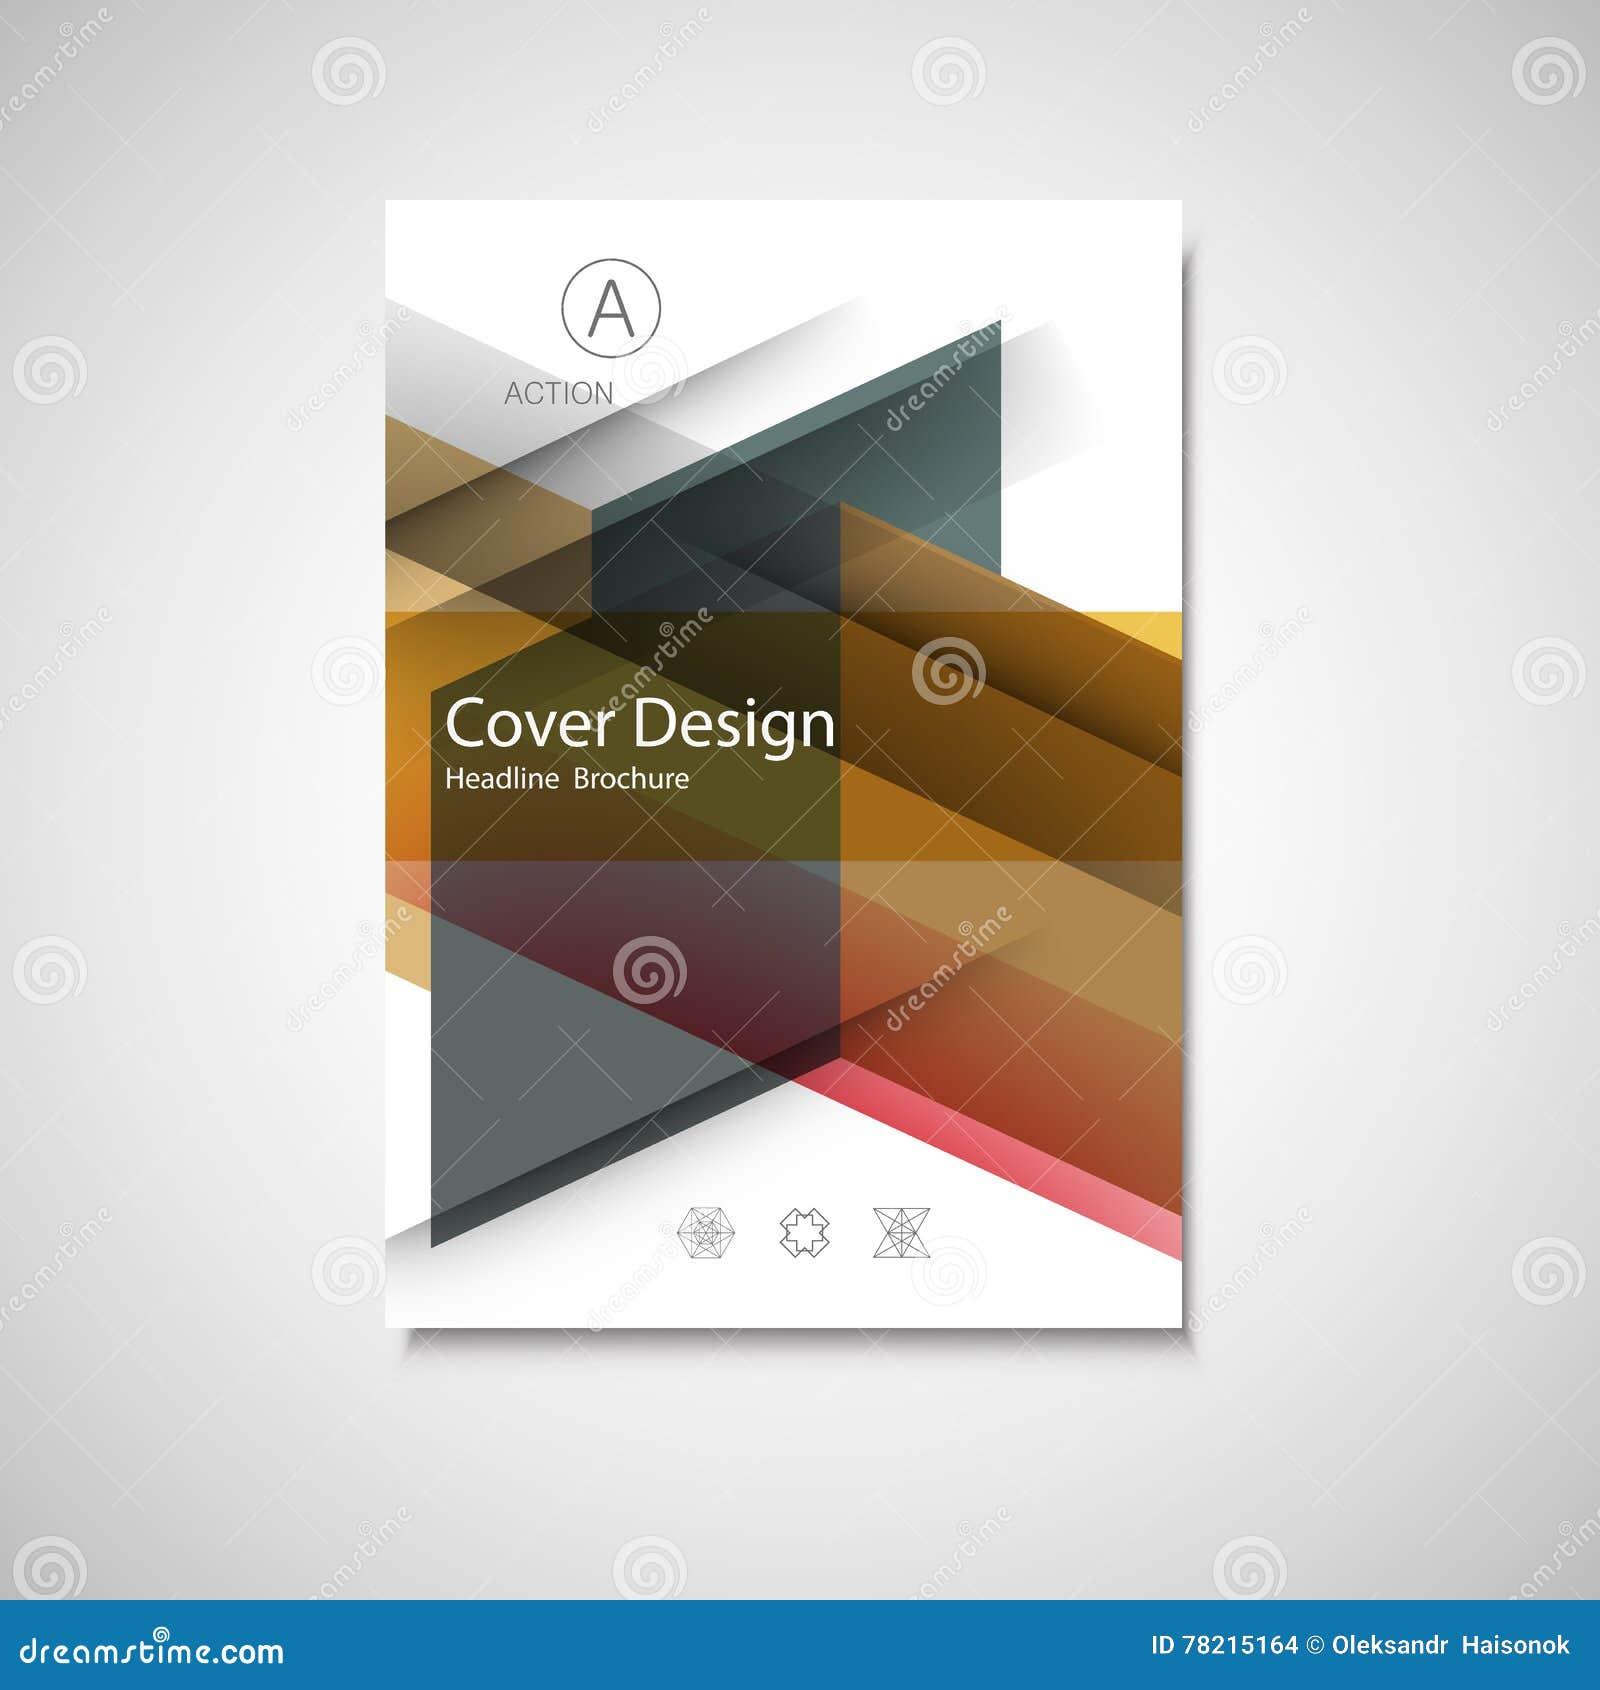 Book Cover Design Photo Elements ~ Cover design for annual report catalog or magazine book